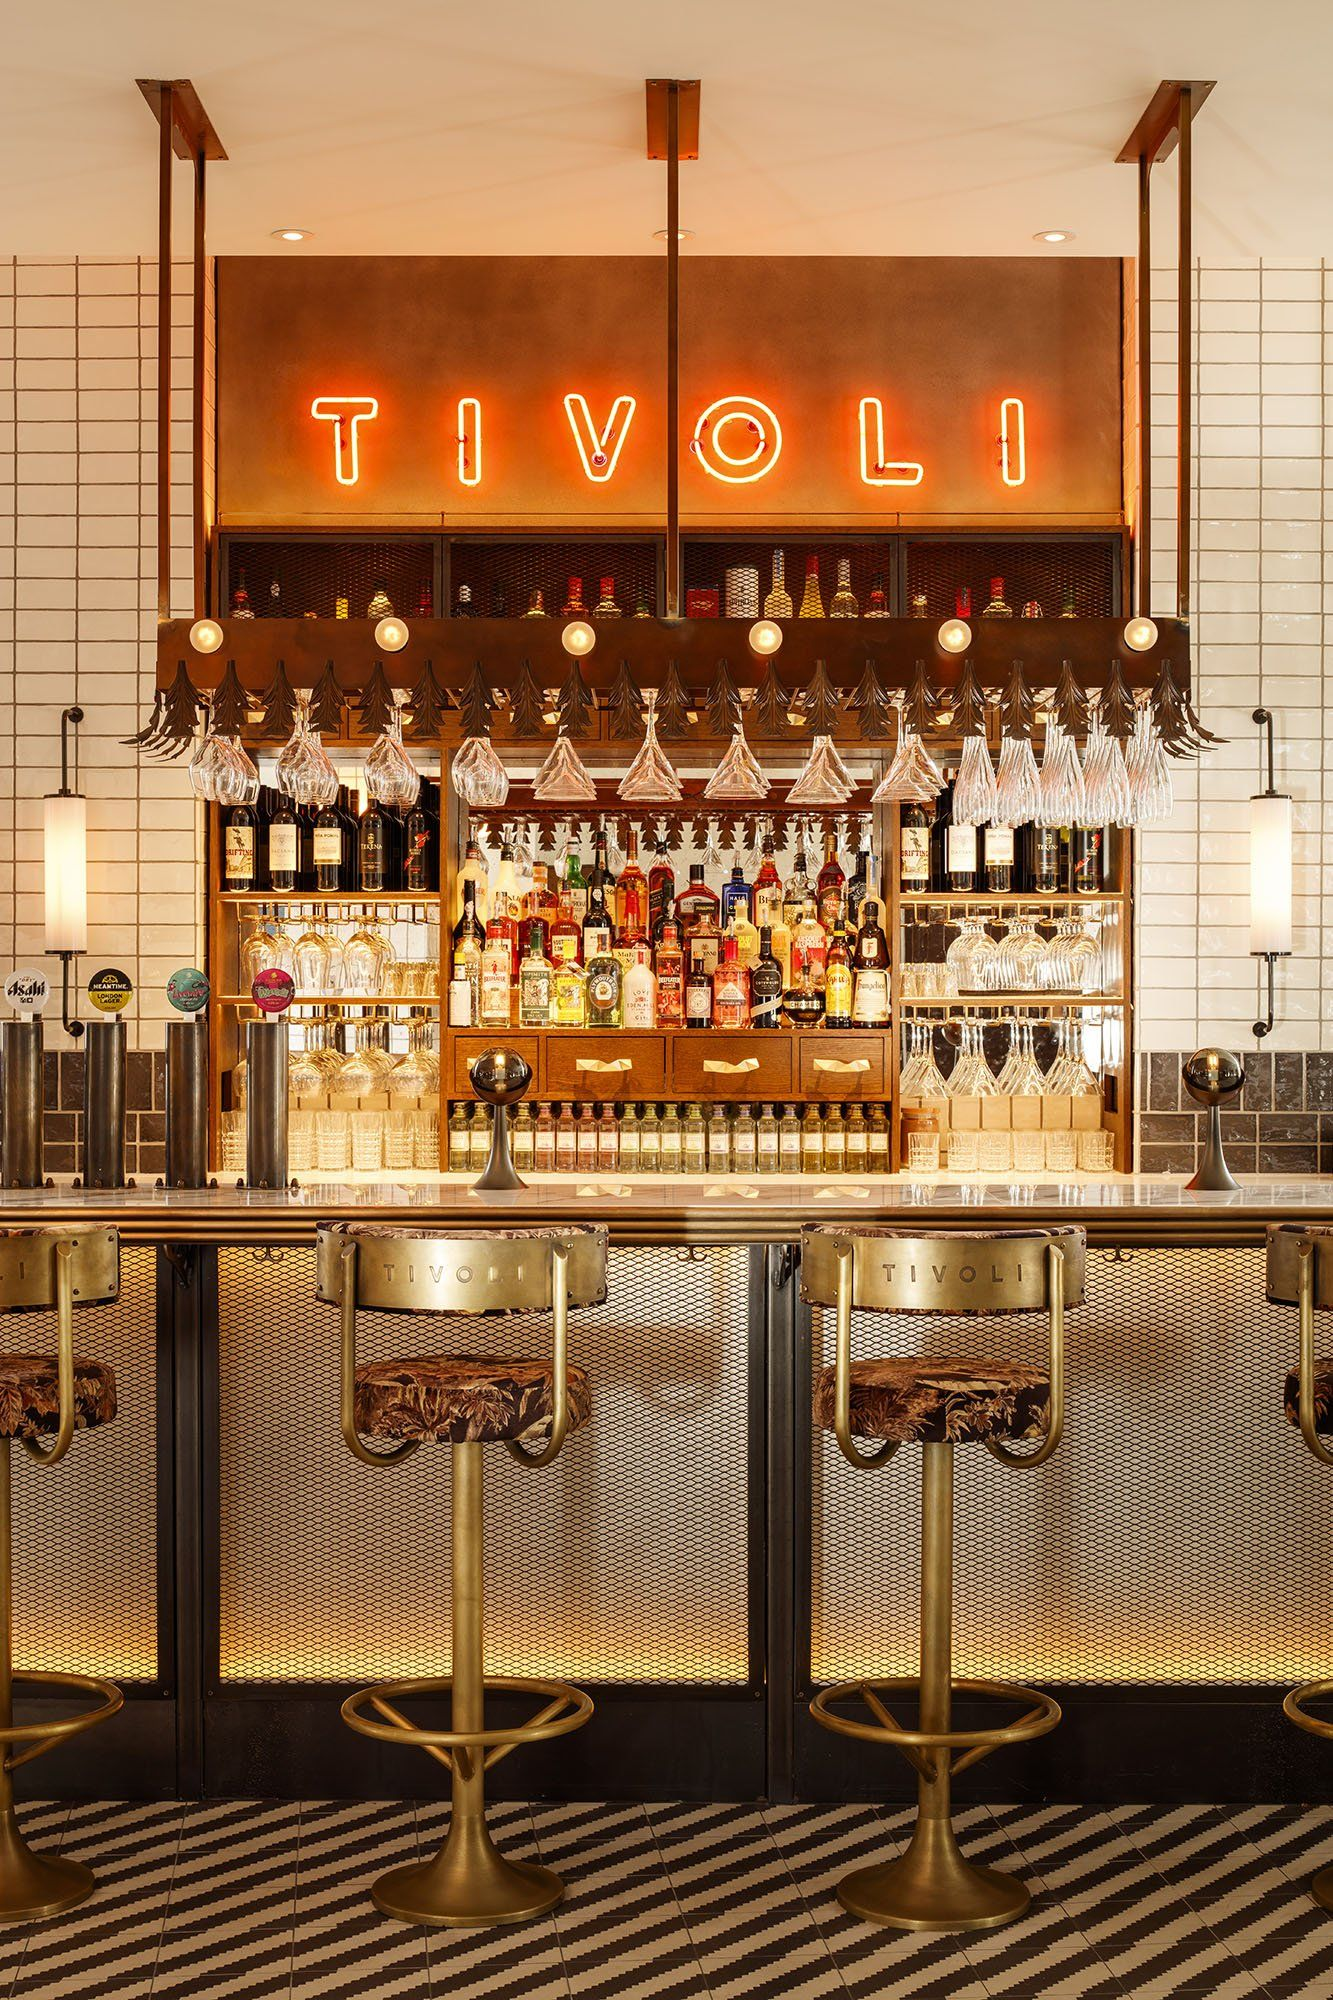 Tivoli Cinema In 2019 Bar Interior Restaurant